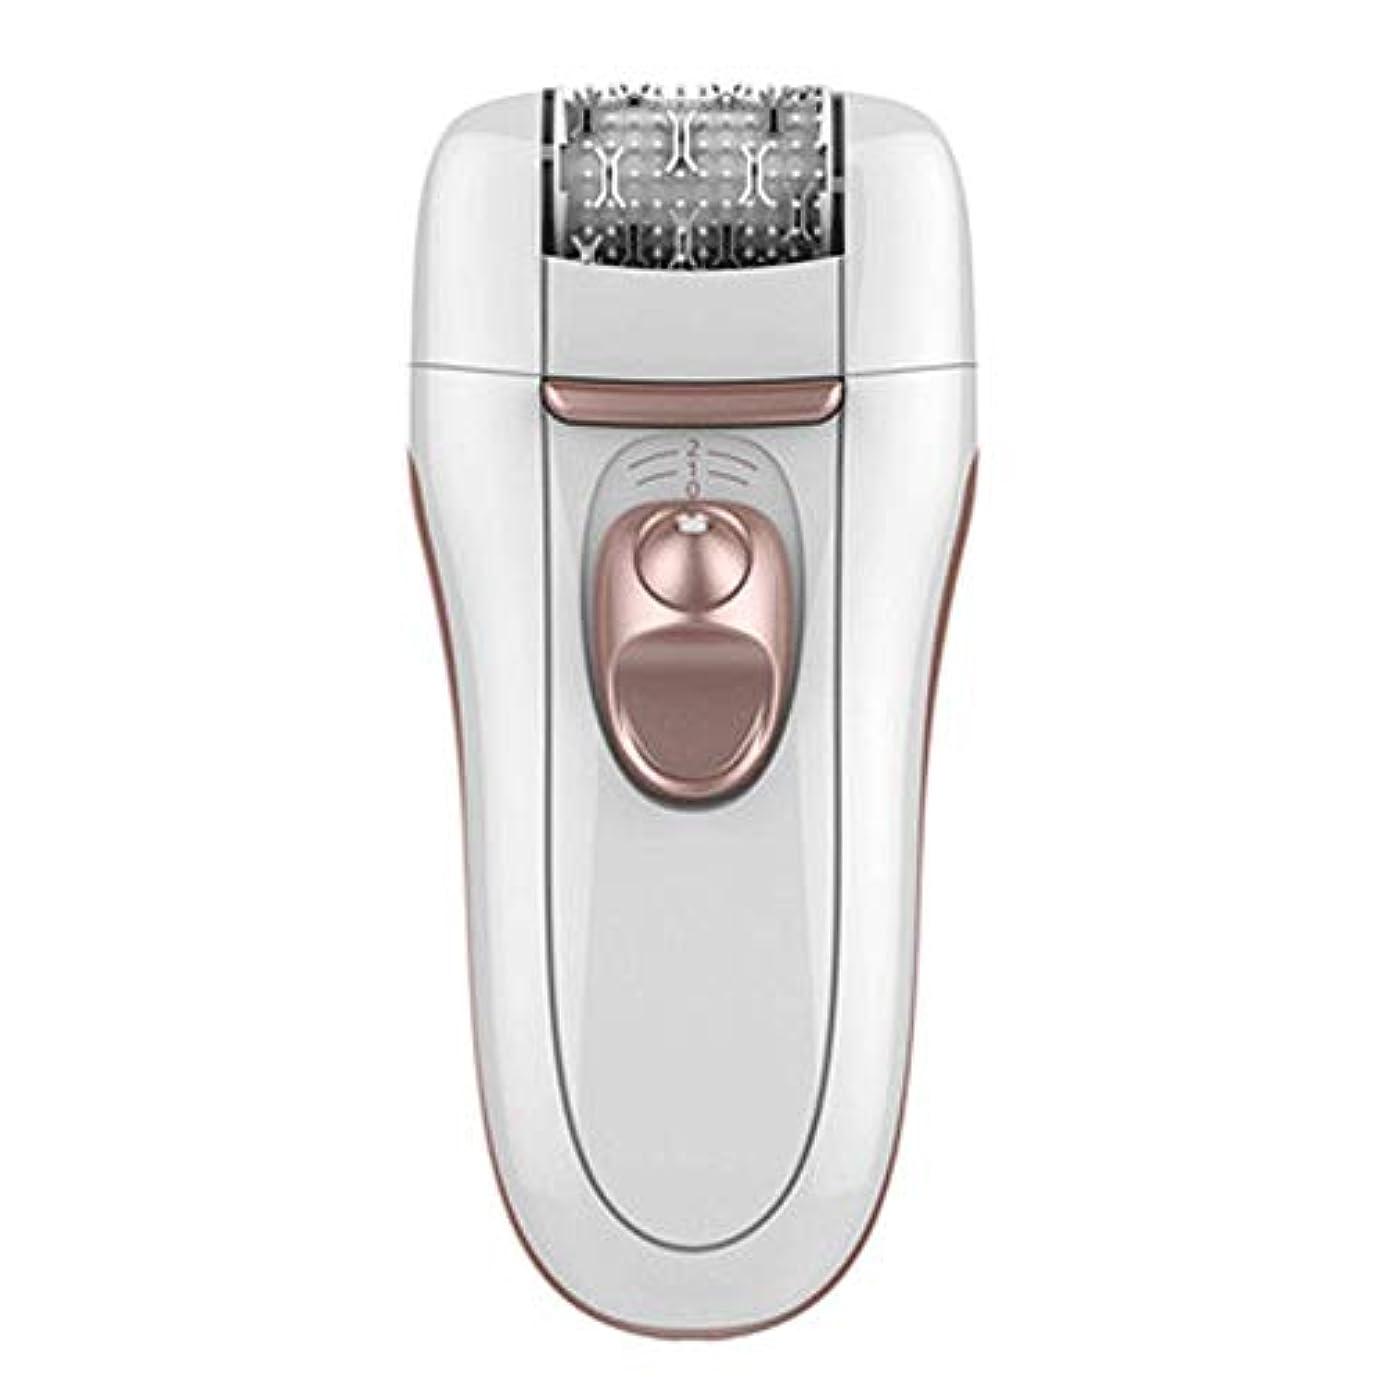 XUEYAQI- 電気アイスポイント脱毛器具、家庭用レーザー脱毛アーティファクト、男性と女性の外部脱毛器、痛みのない顔用脱毛器(ローズゴールド)